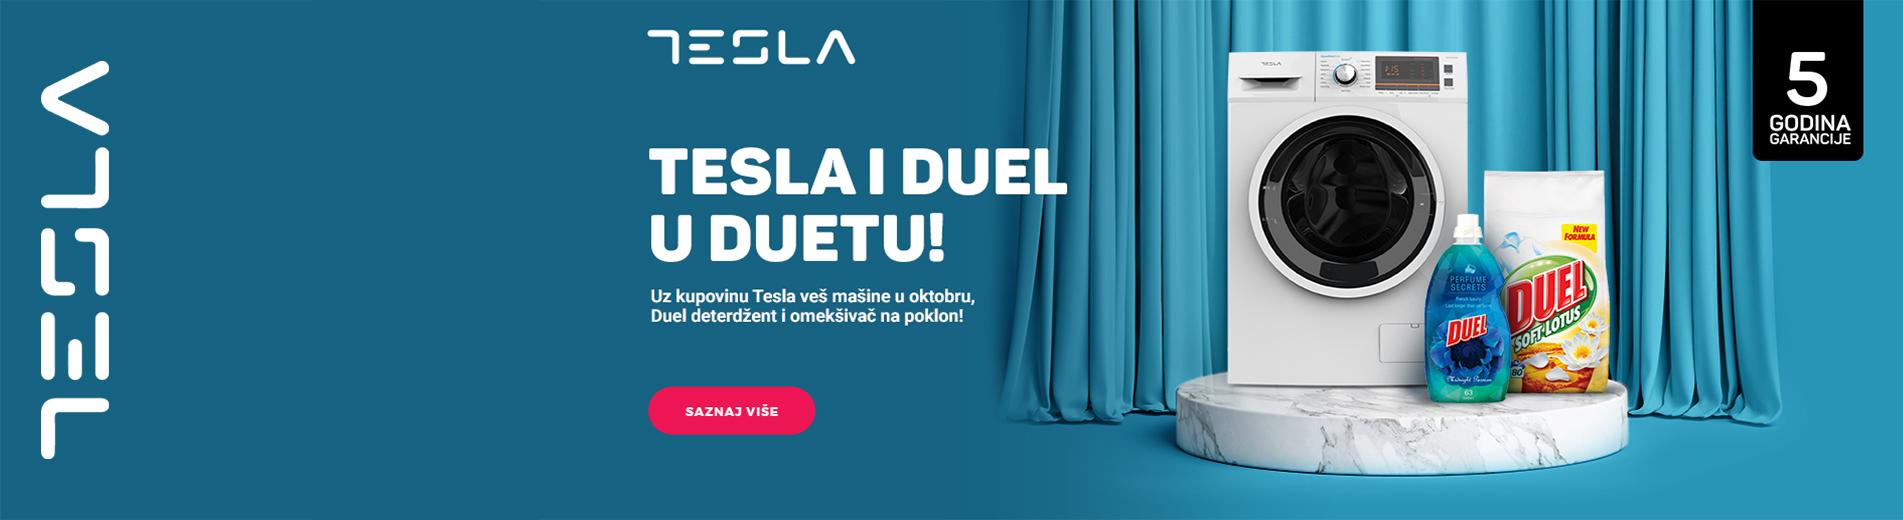 Tesla i Duel u duetu